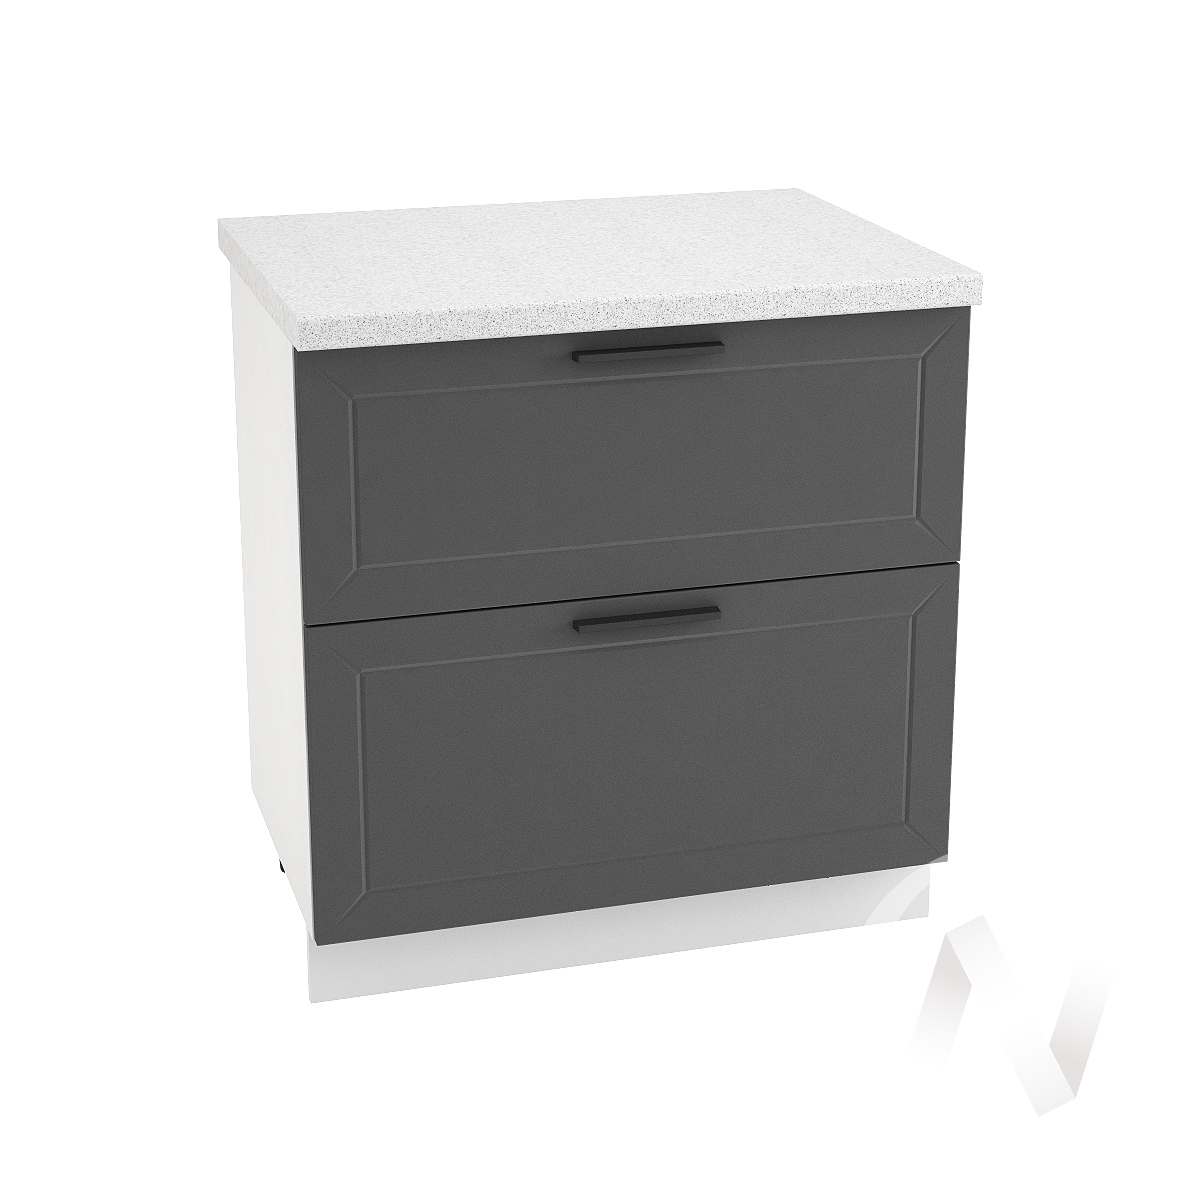 "Кухня ""Глетчер"": Шкаф нижний с 2-мя ящиками 800, ШН2Я 800 (Маренго силк/корпус белый)"